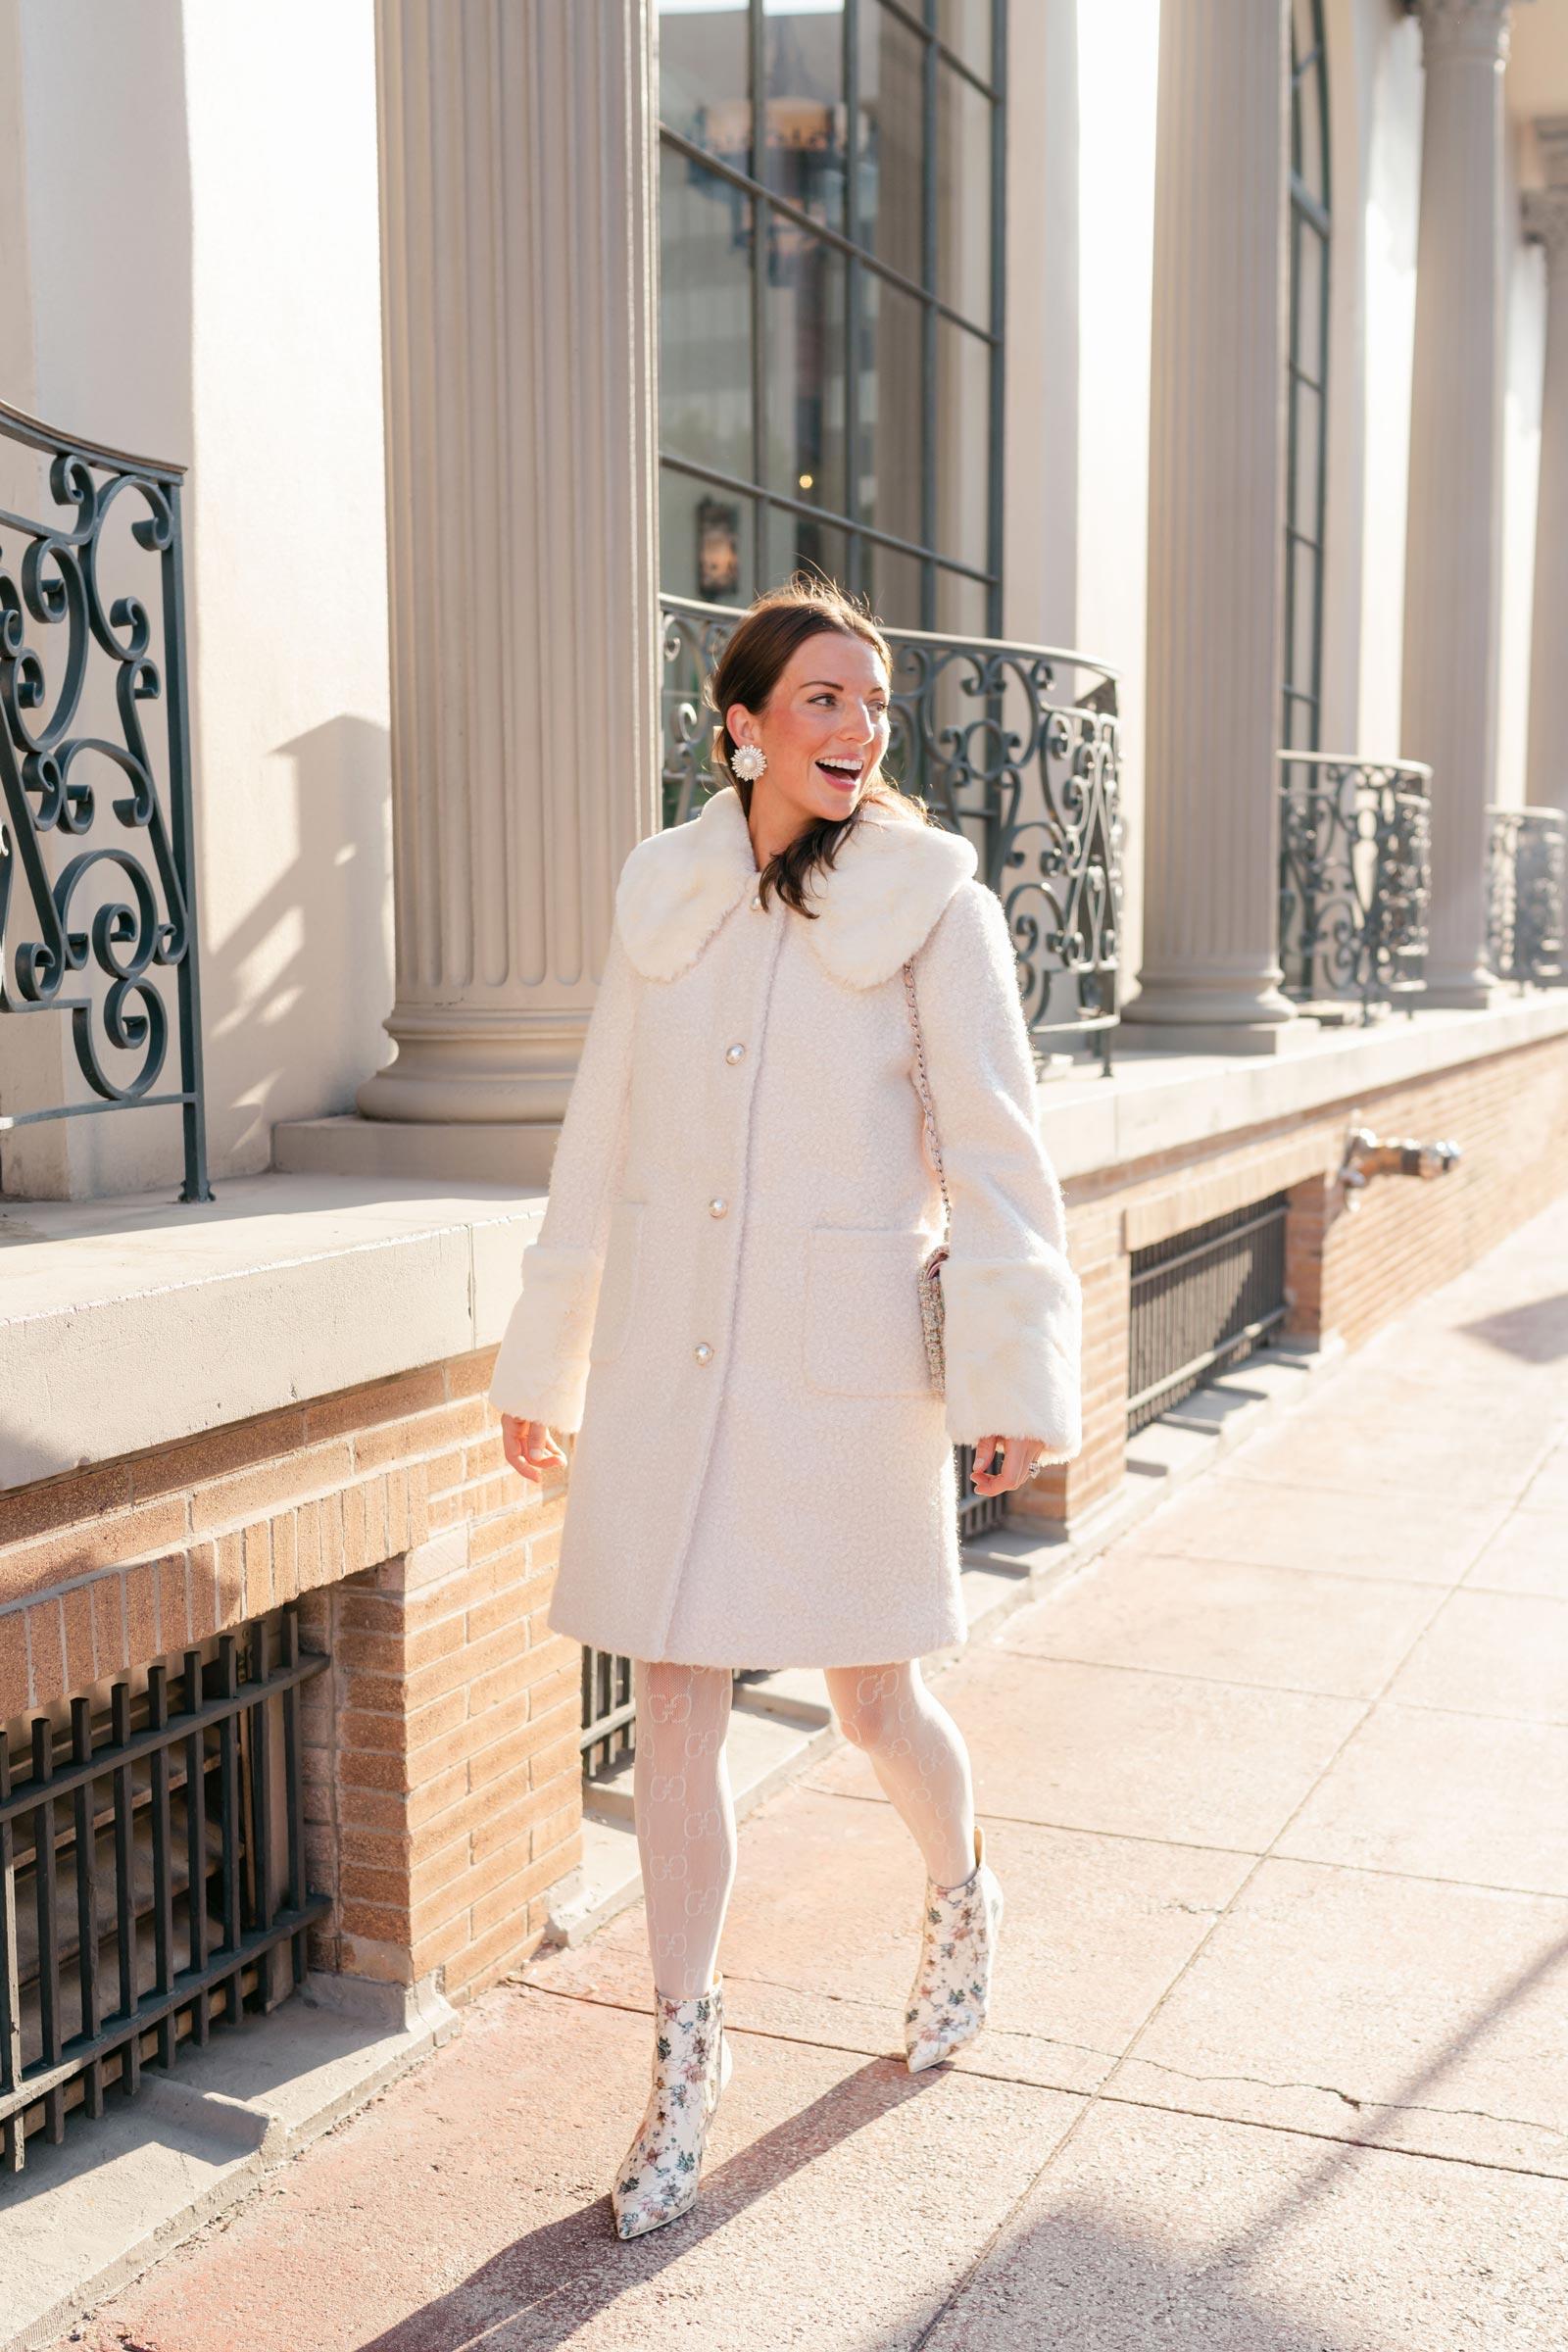 nicola bathie dillards coat